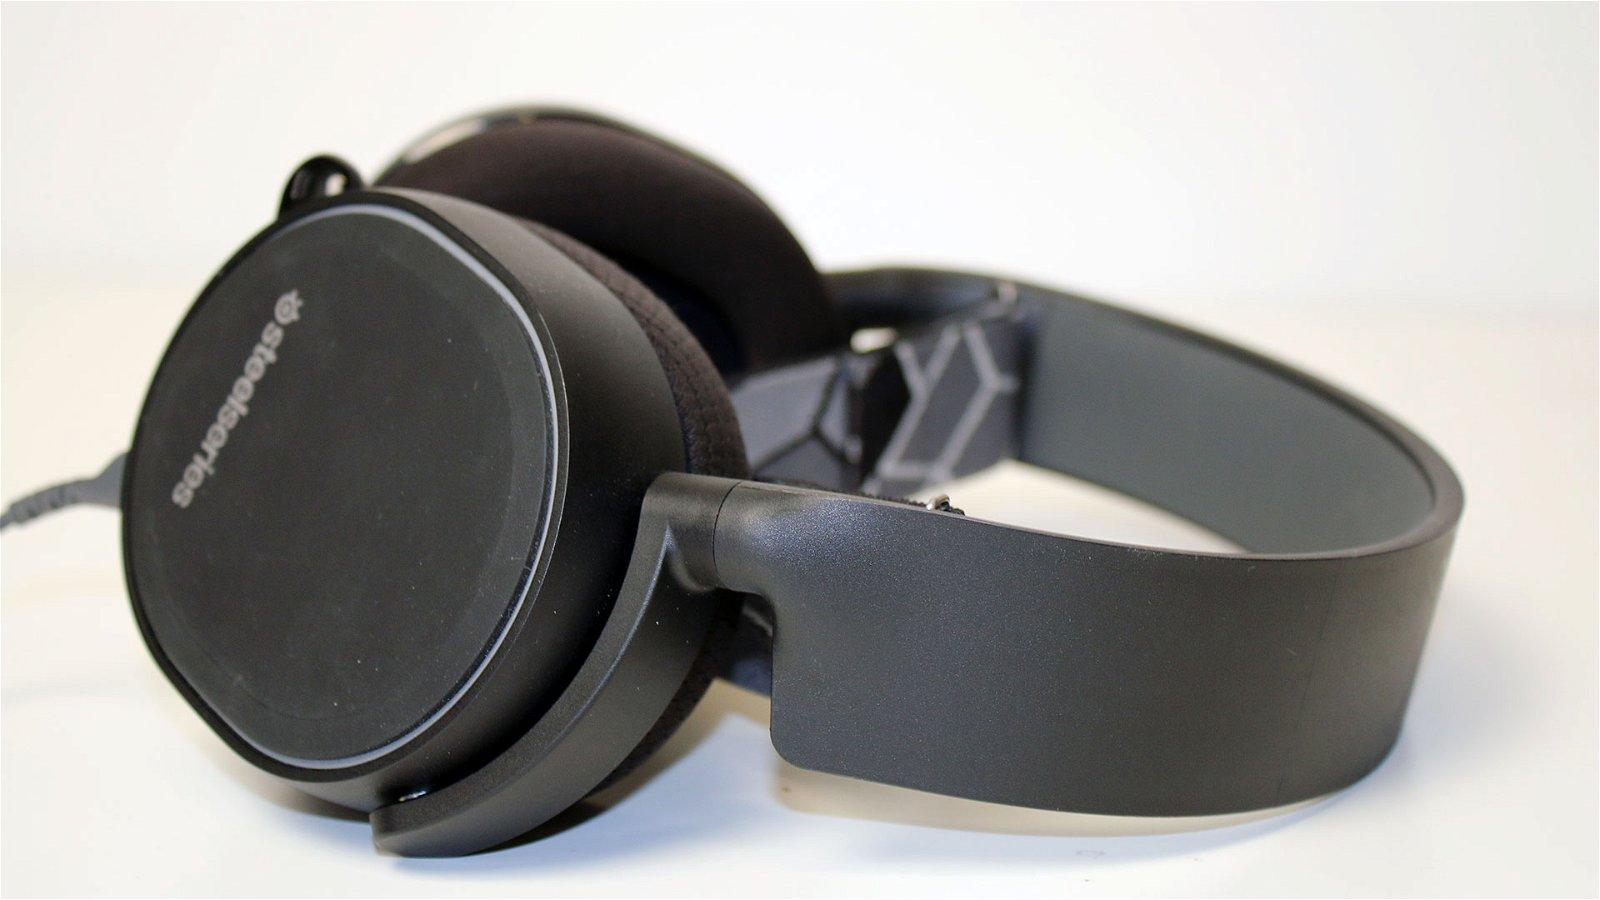 Steelseries Arctis 3 (Headset) Review 1